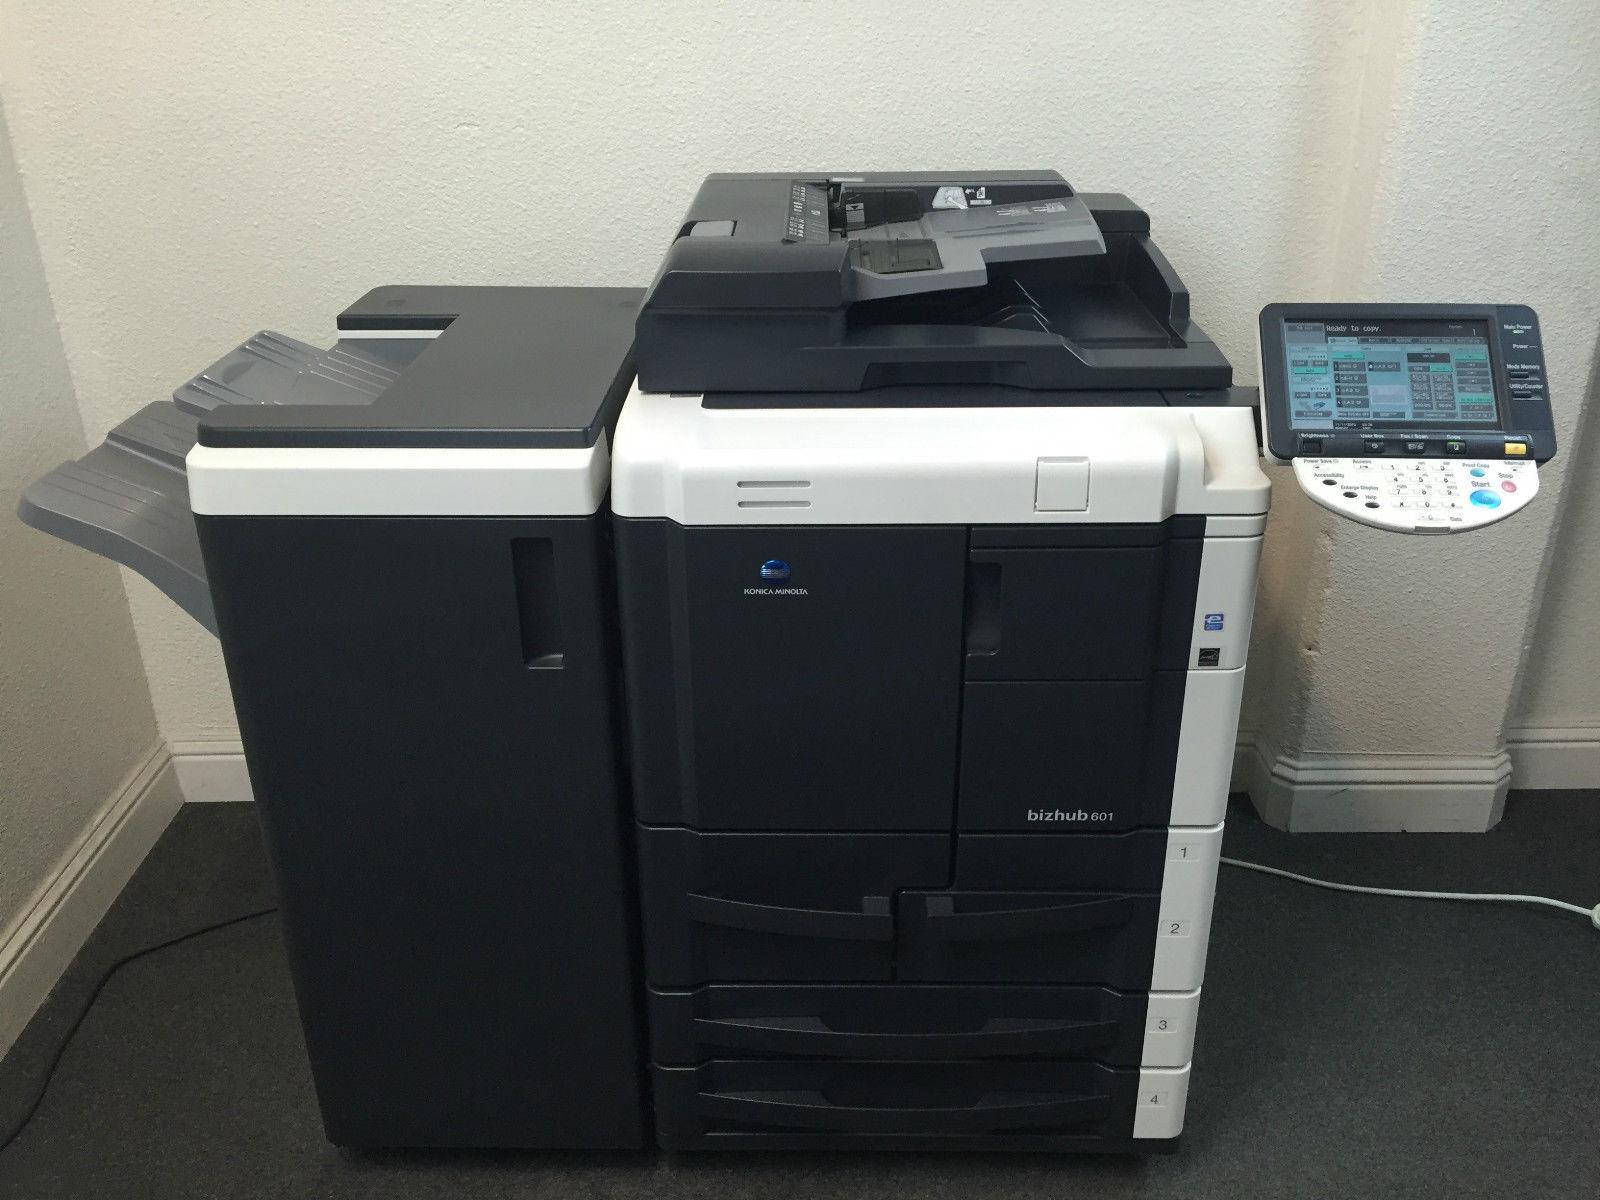 Konica Minolta Bizhub 601 Copier Printer Scanner & Staple LOW 286k total pages by Konica